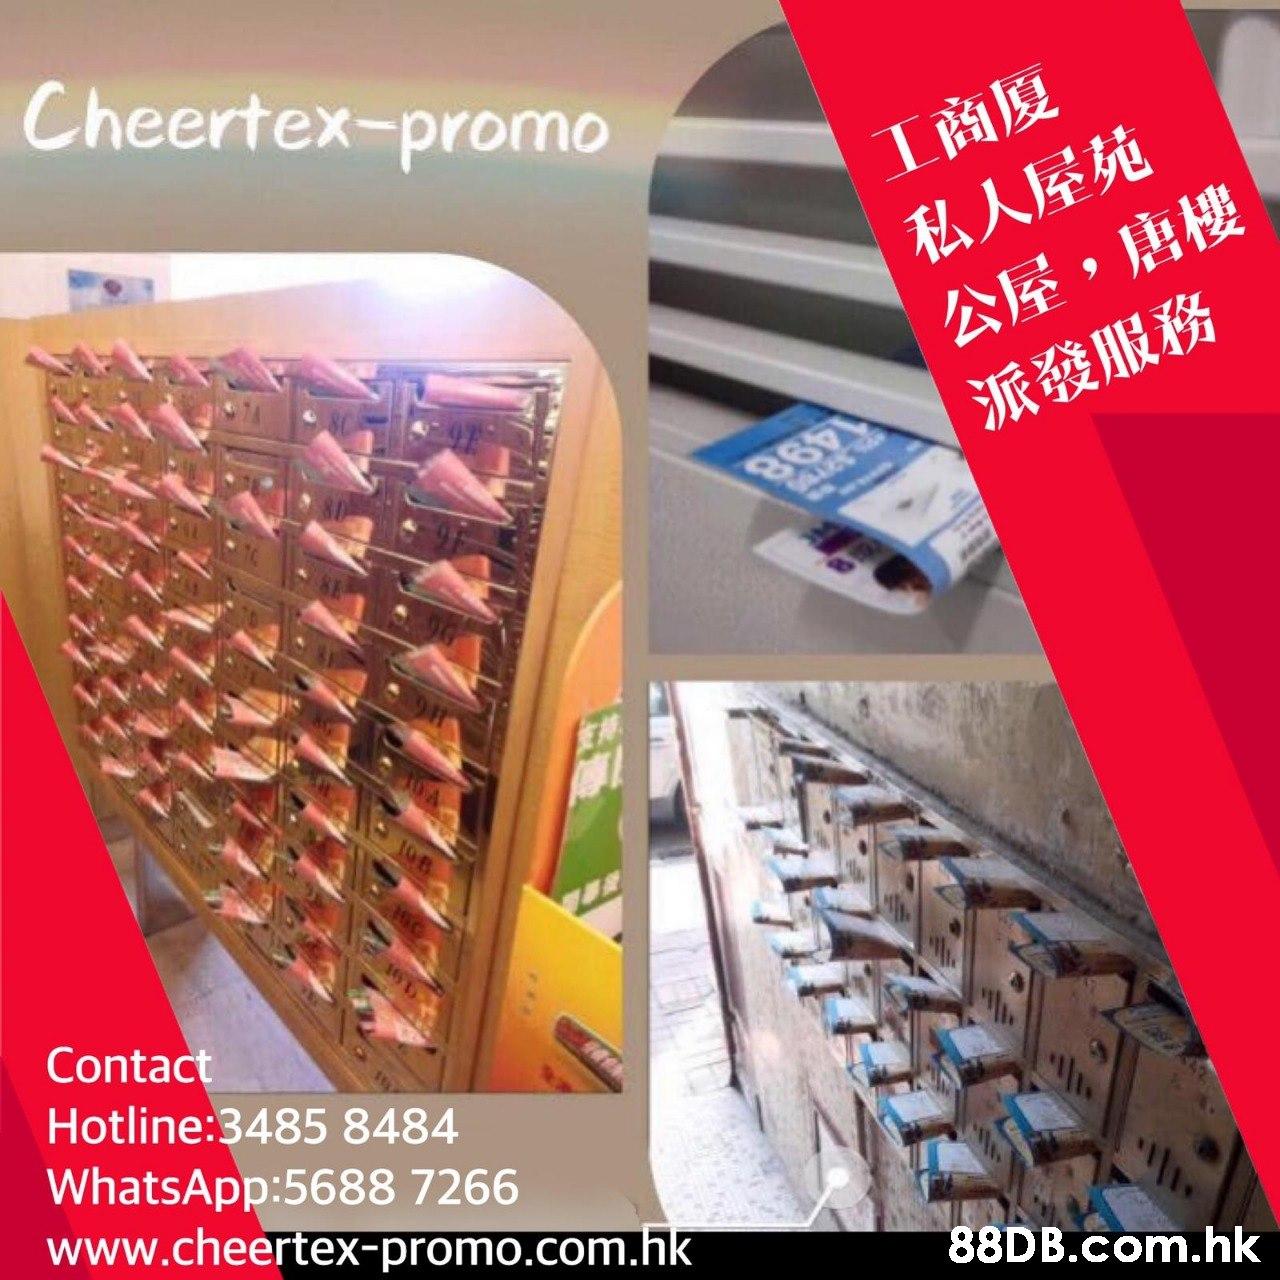 Cheertex-promo 私人屋苑 公屋,唐樓 派 Contact Hotline:3485 8484 WhatsApp:5688 7266 www.cheertex-promo.com.hk .hk